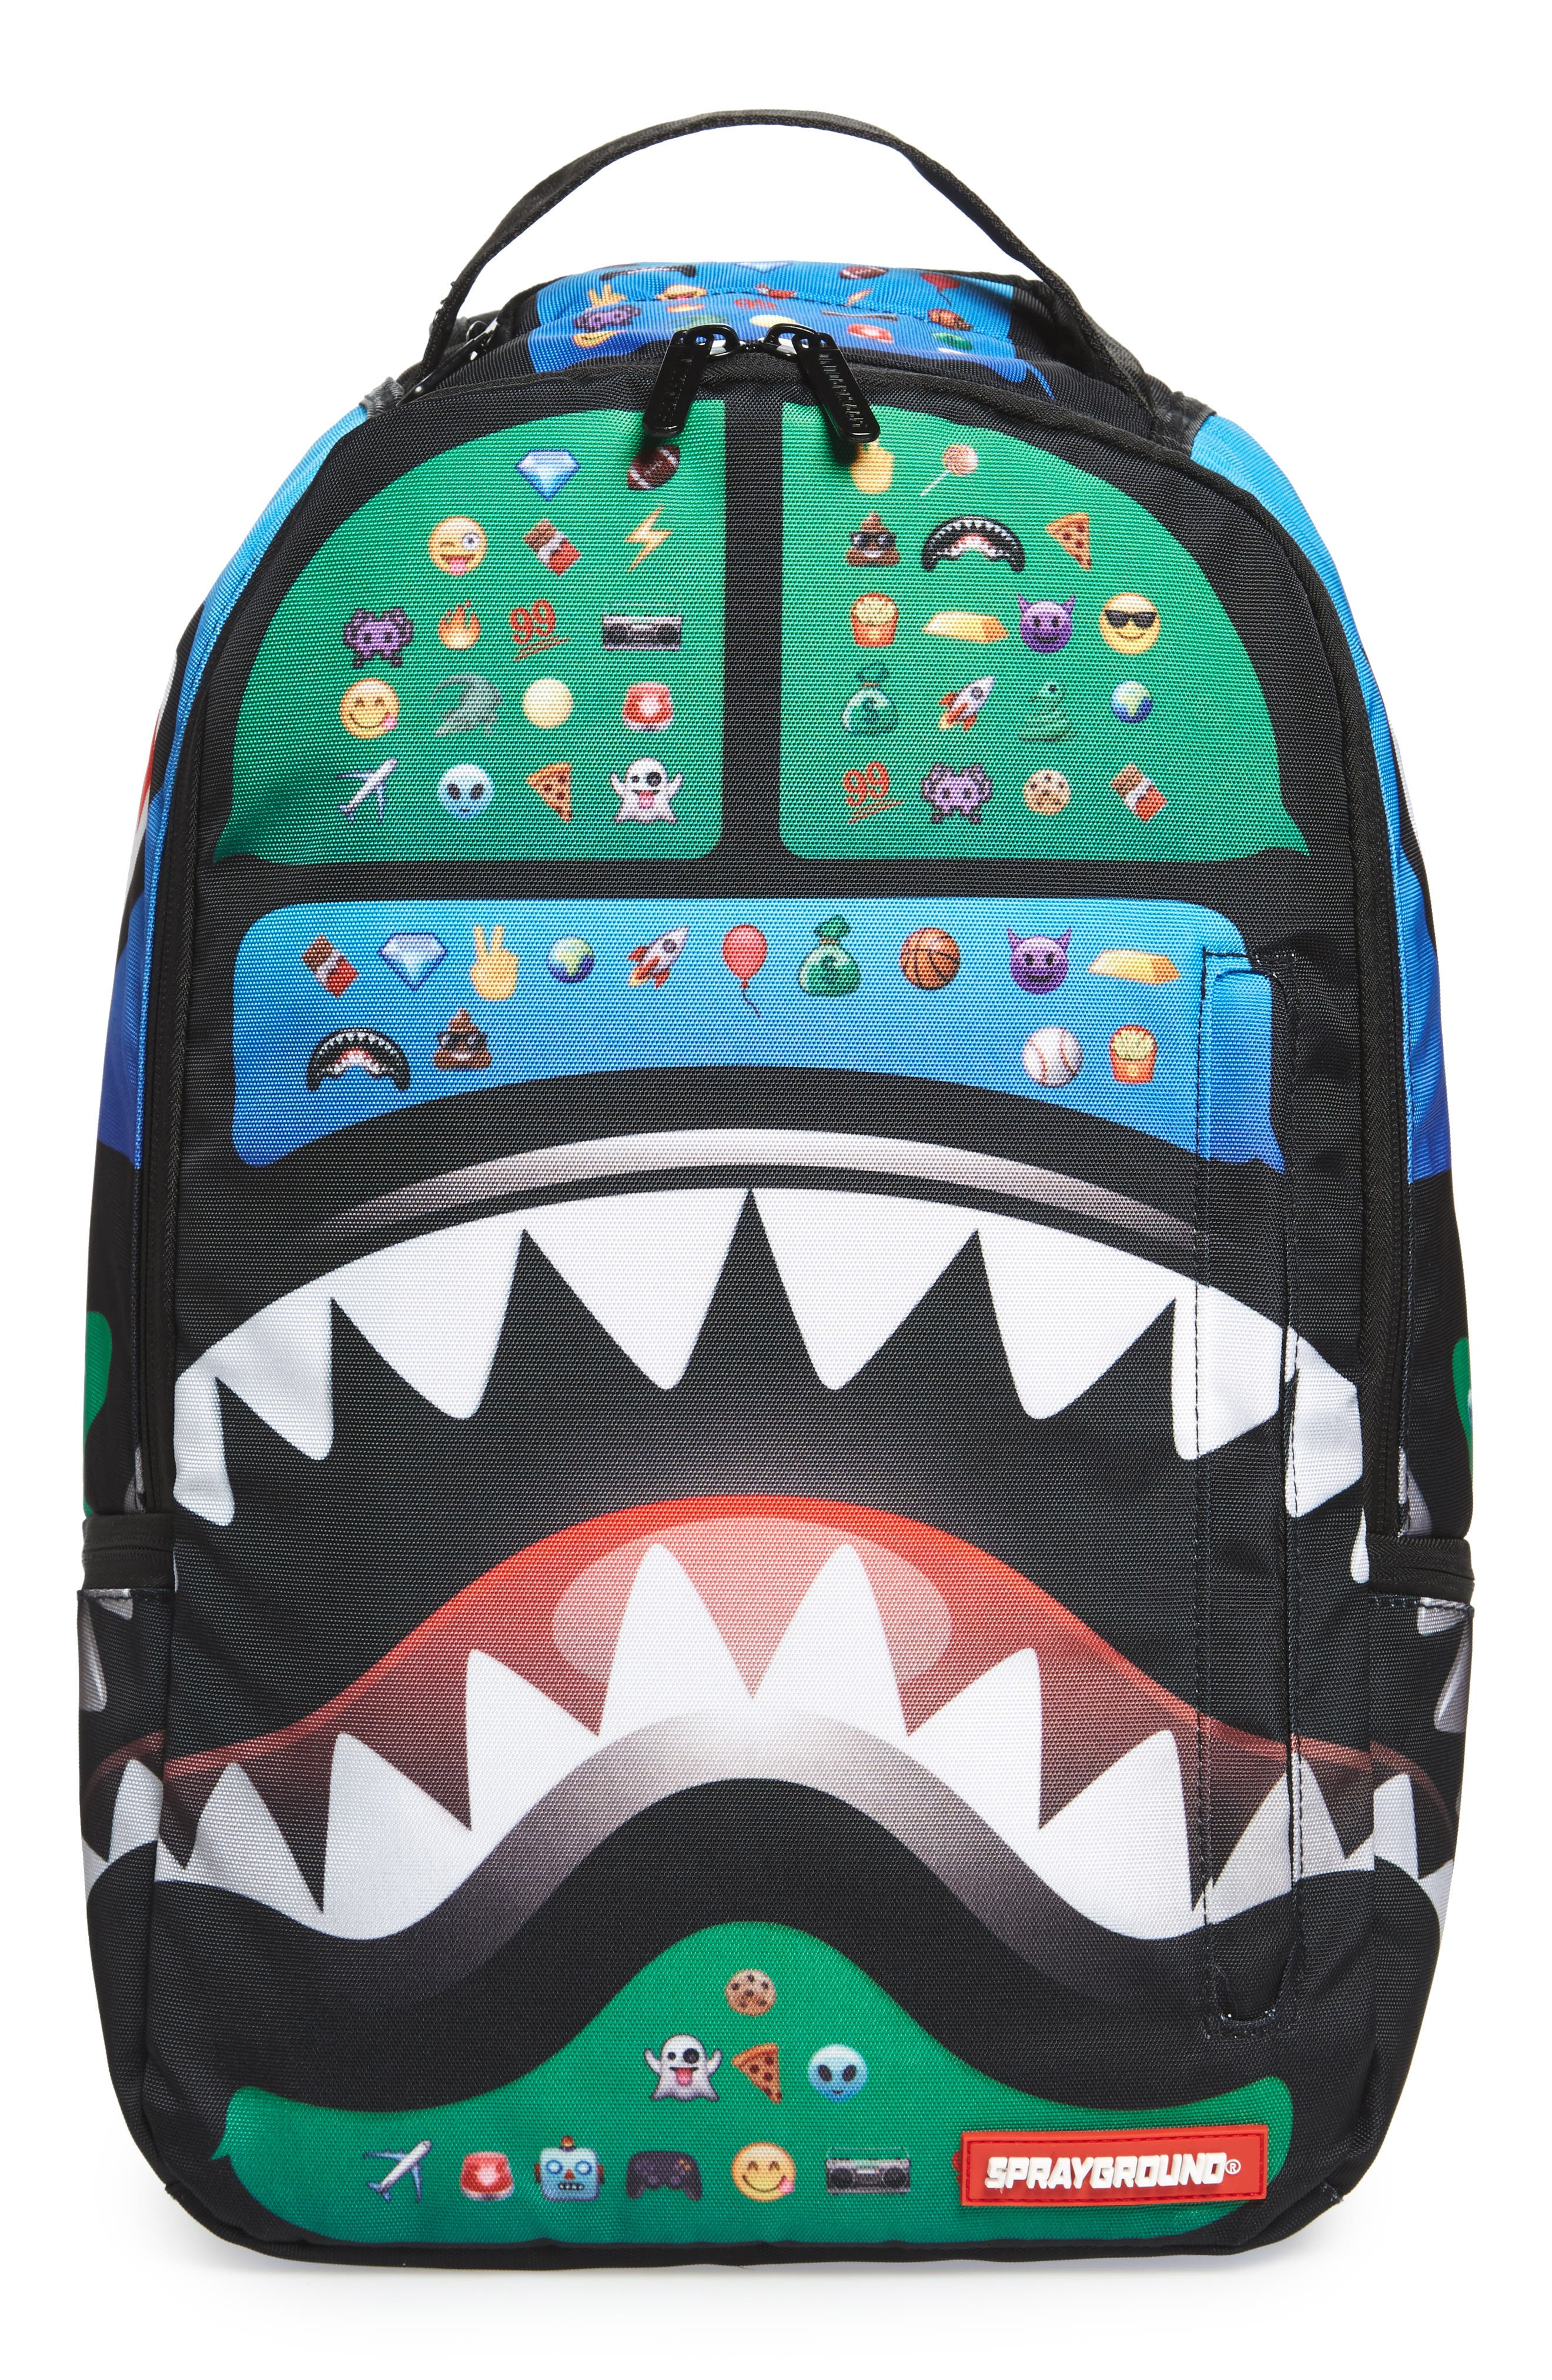 Alternate Image 1 Selected - Sprayground Emoji Shark Backpack (Kids)